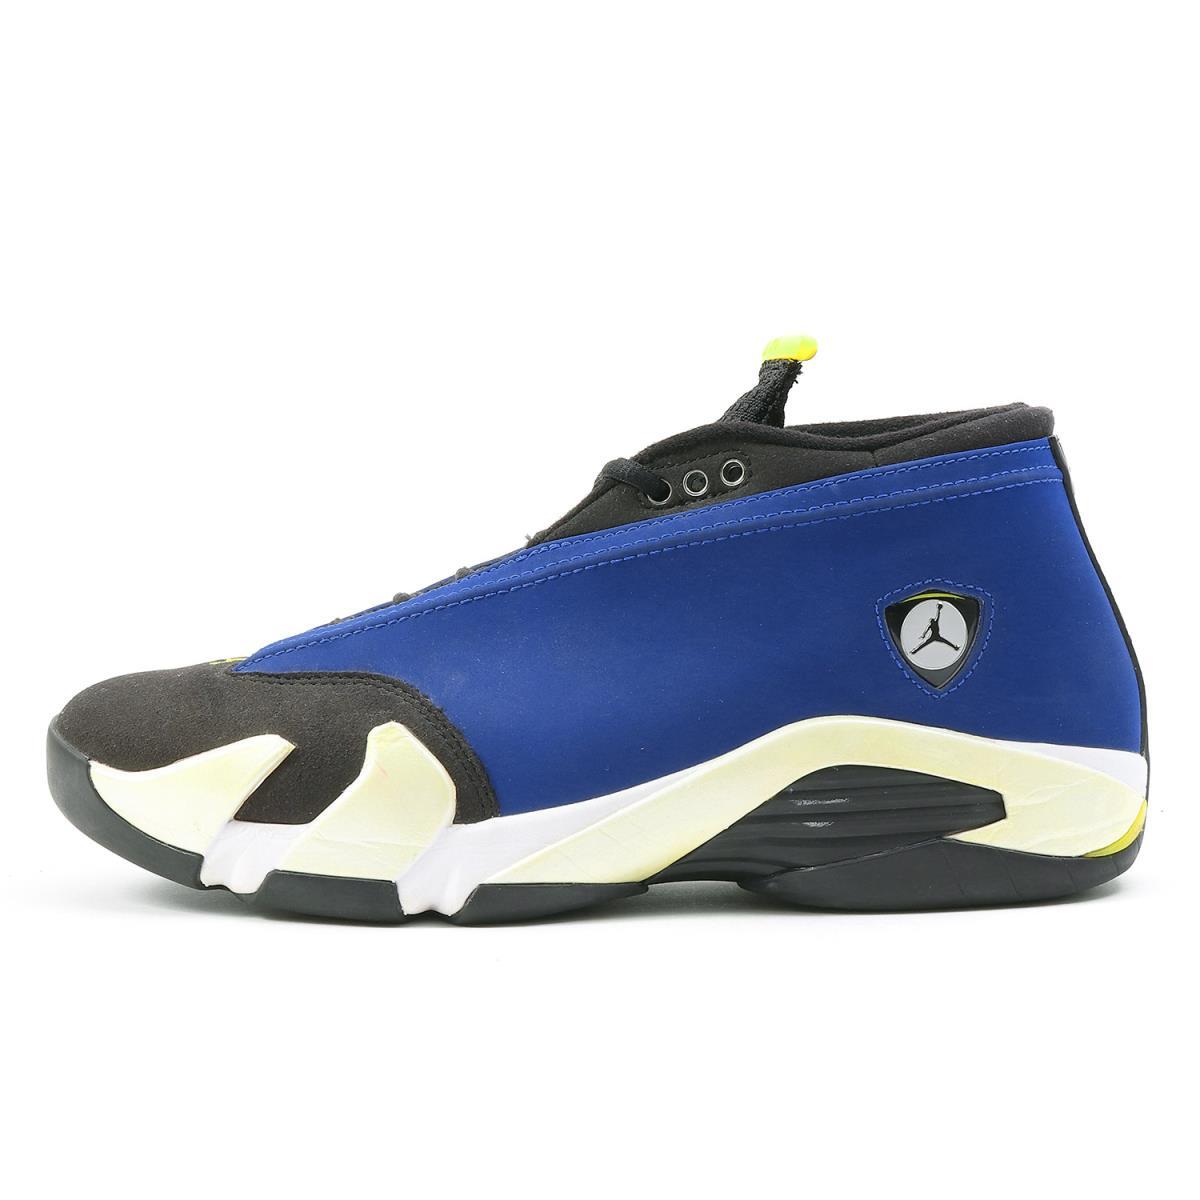 competitive price 2180f 61d6a NIKE (Nike) AIR JORDAN 14 RETRO LOW LANEY (807,511-405) bar city royal  US9(27cm)